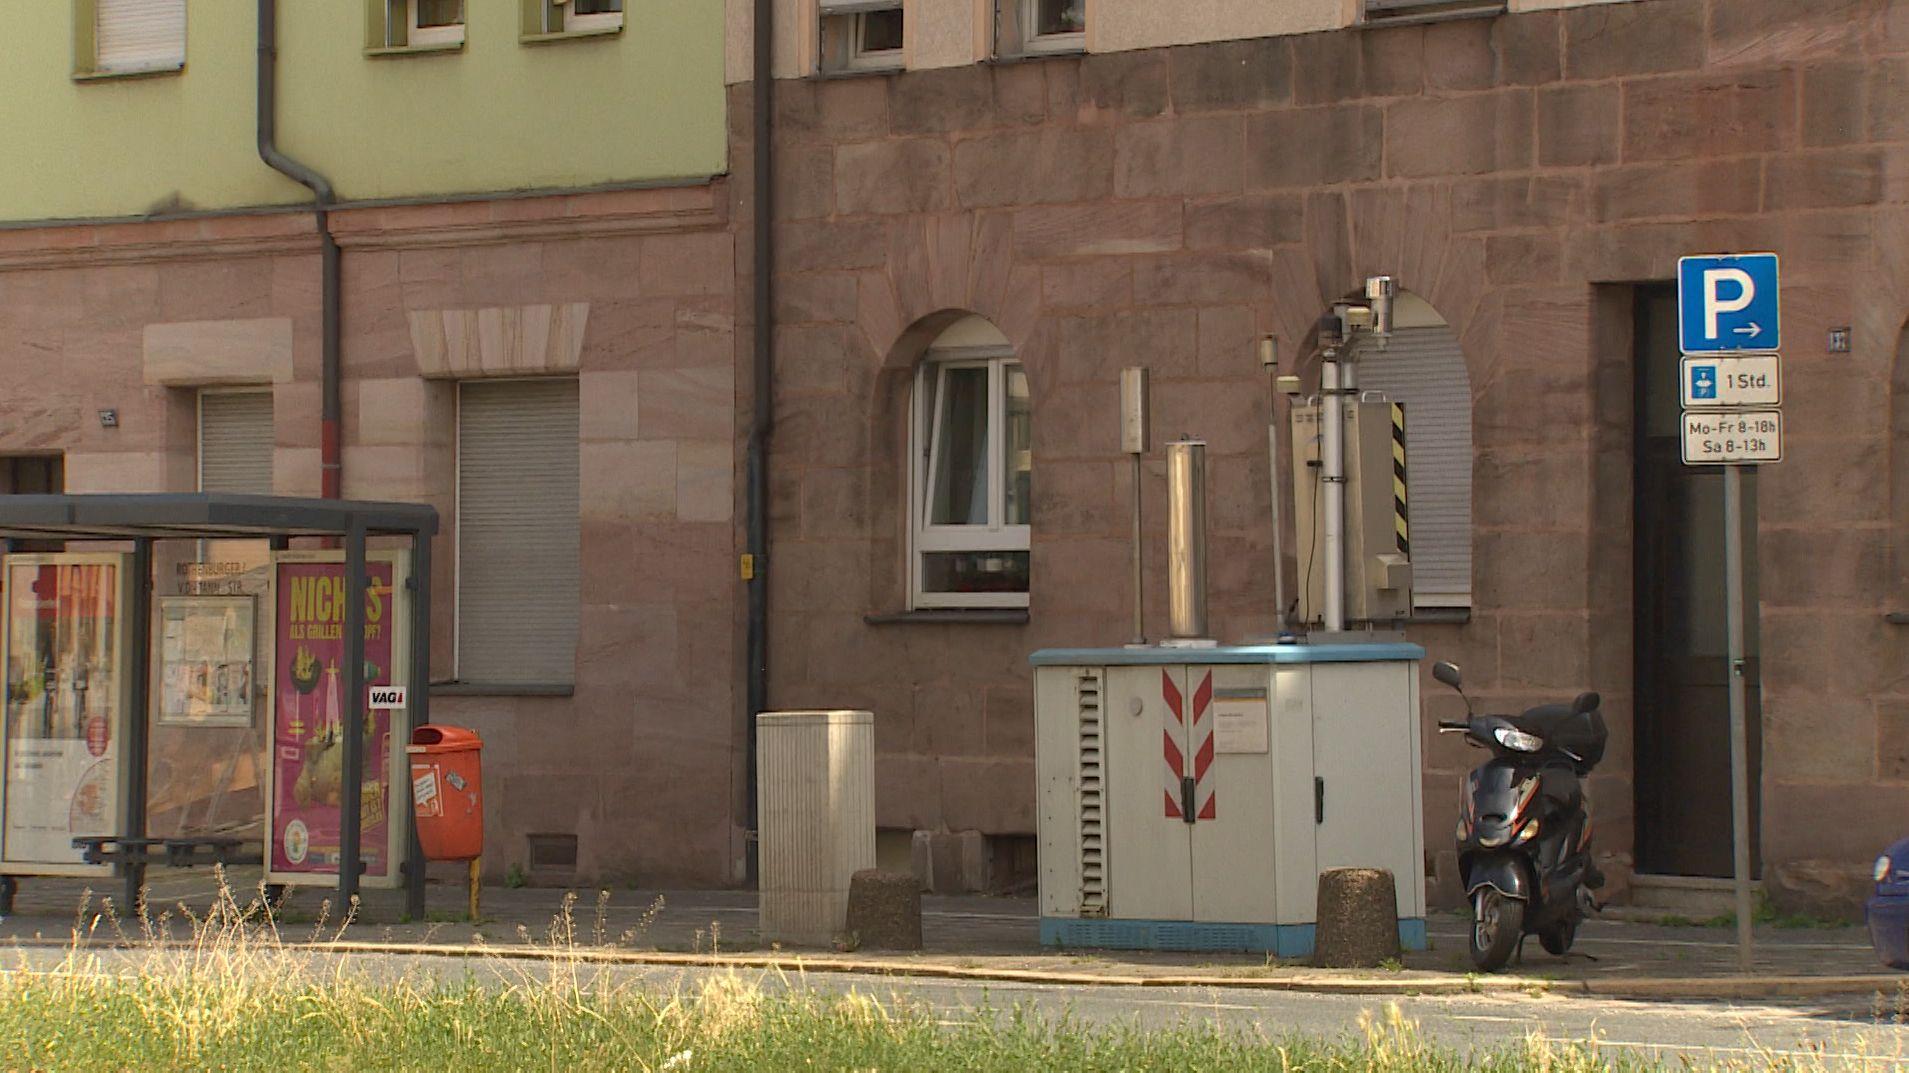 Luftmessung in Nürnberg